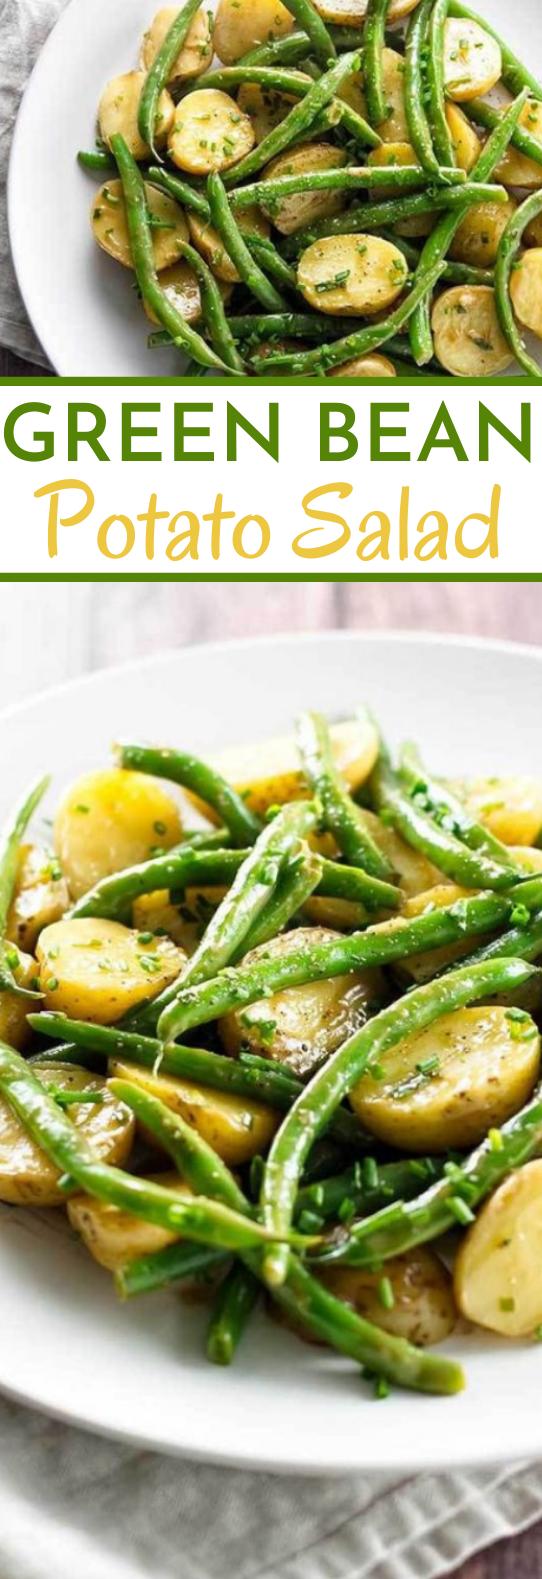 Green Bean Potato Salad #vegan #salad #healthy #gluenfree #sidedish